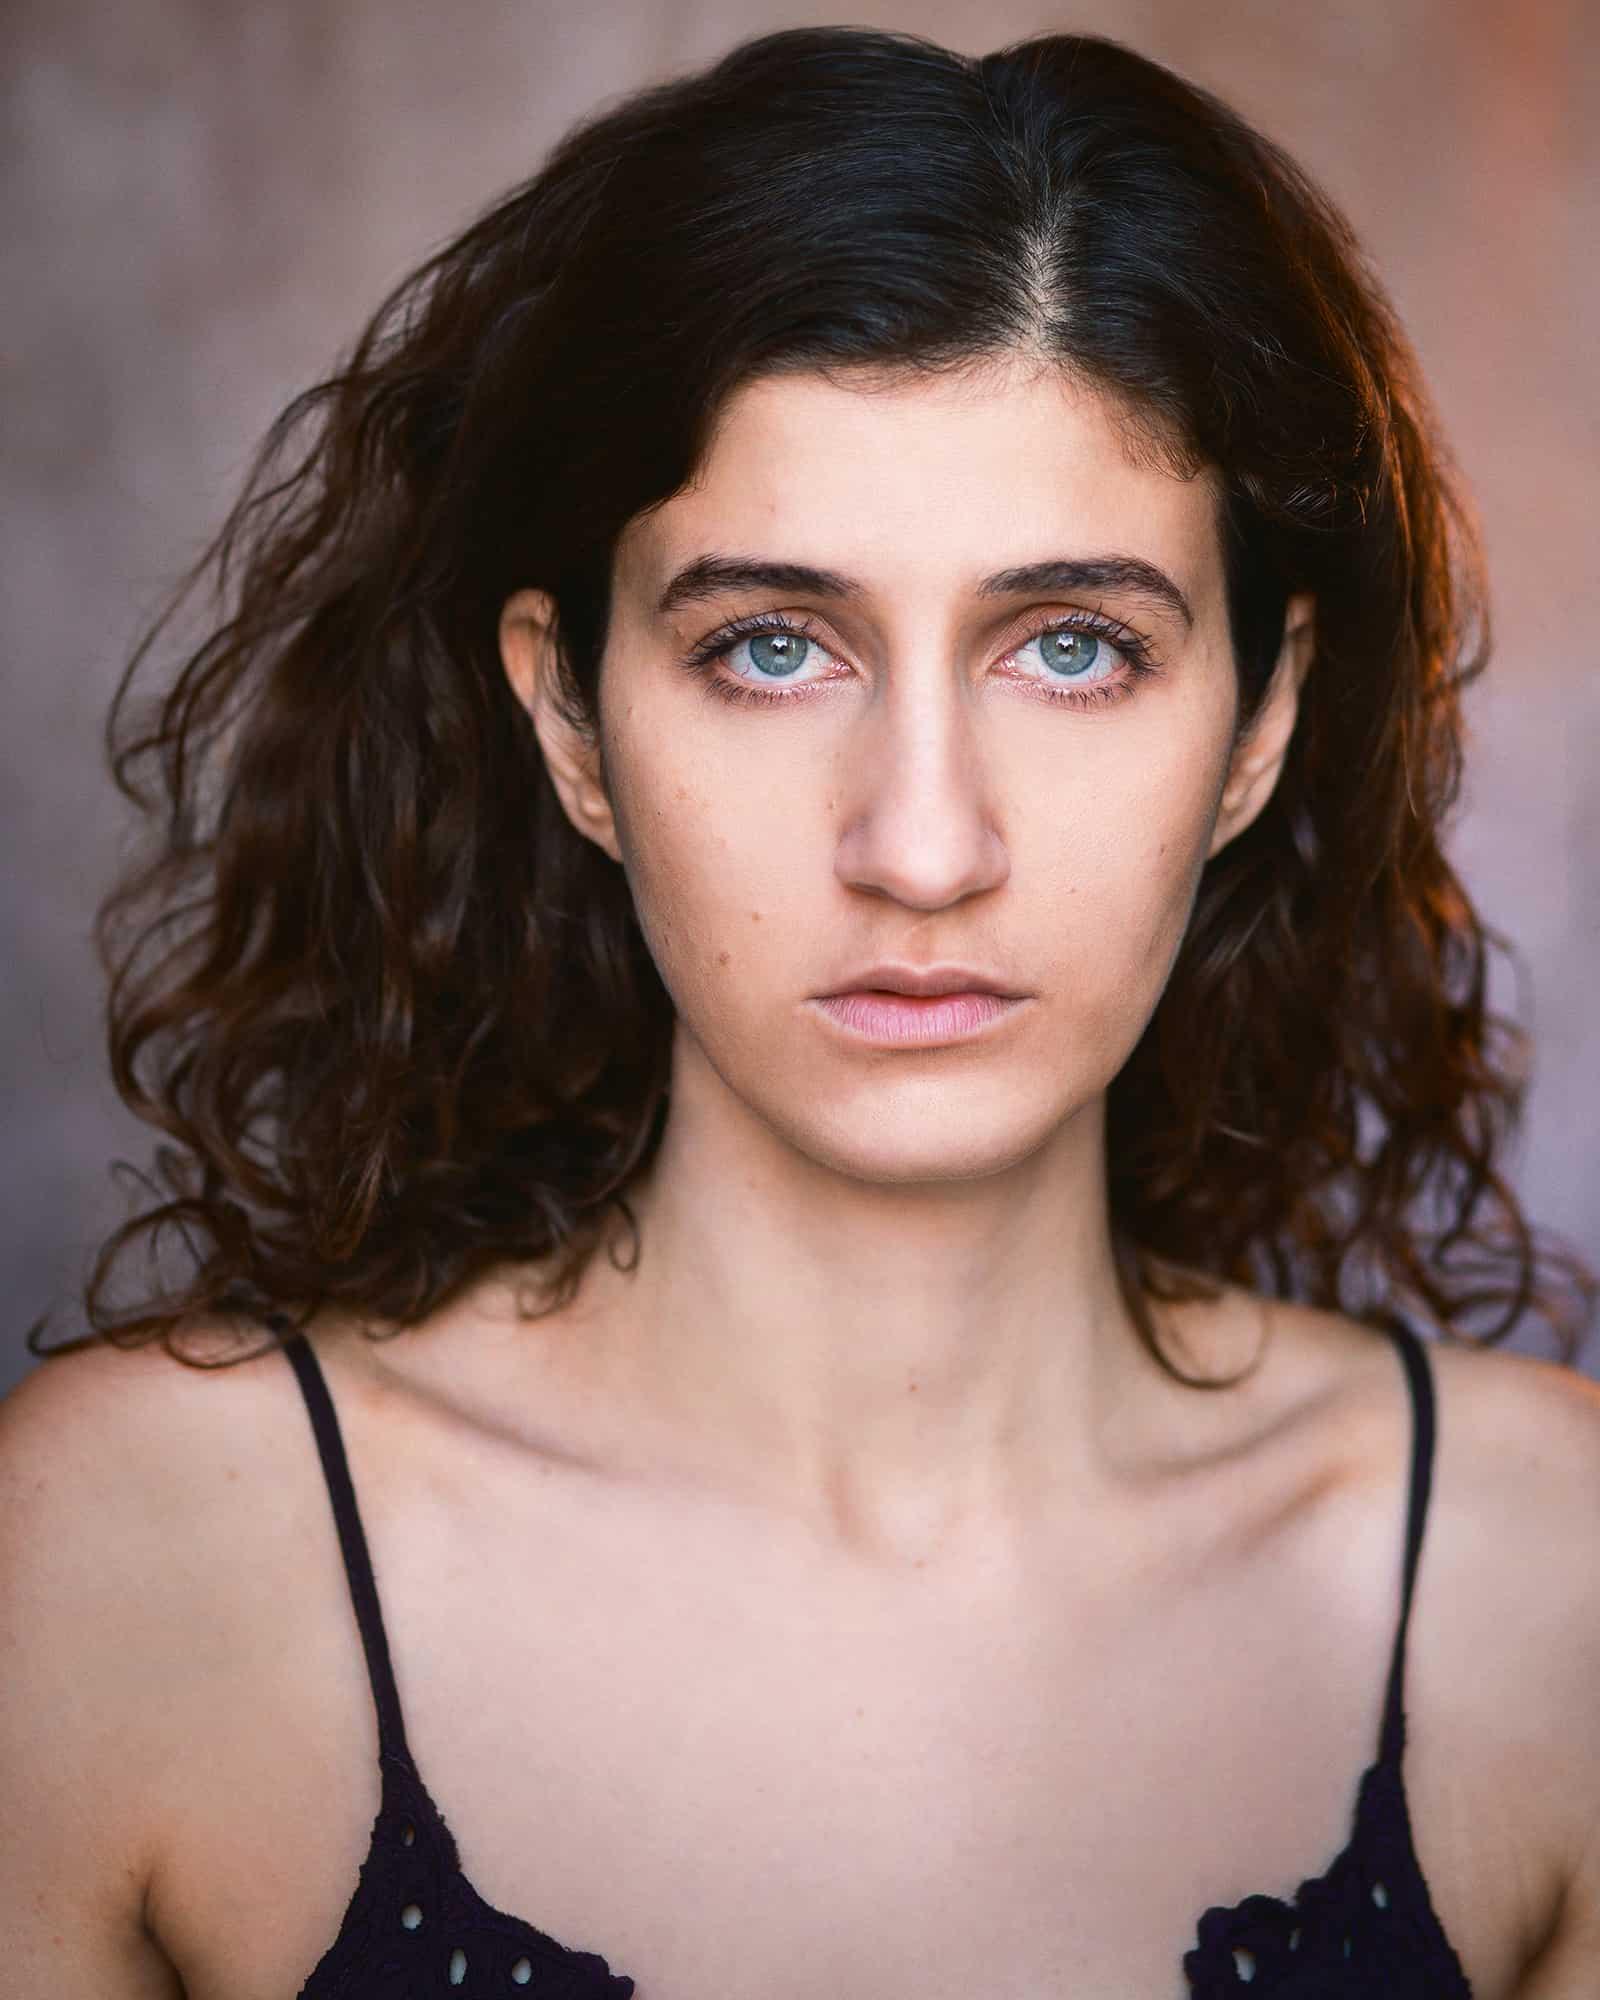 Laura Percival